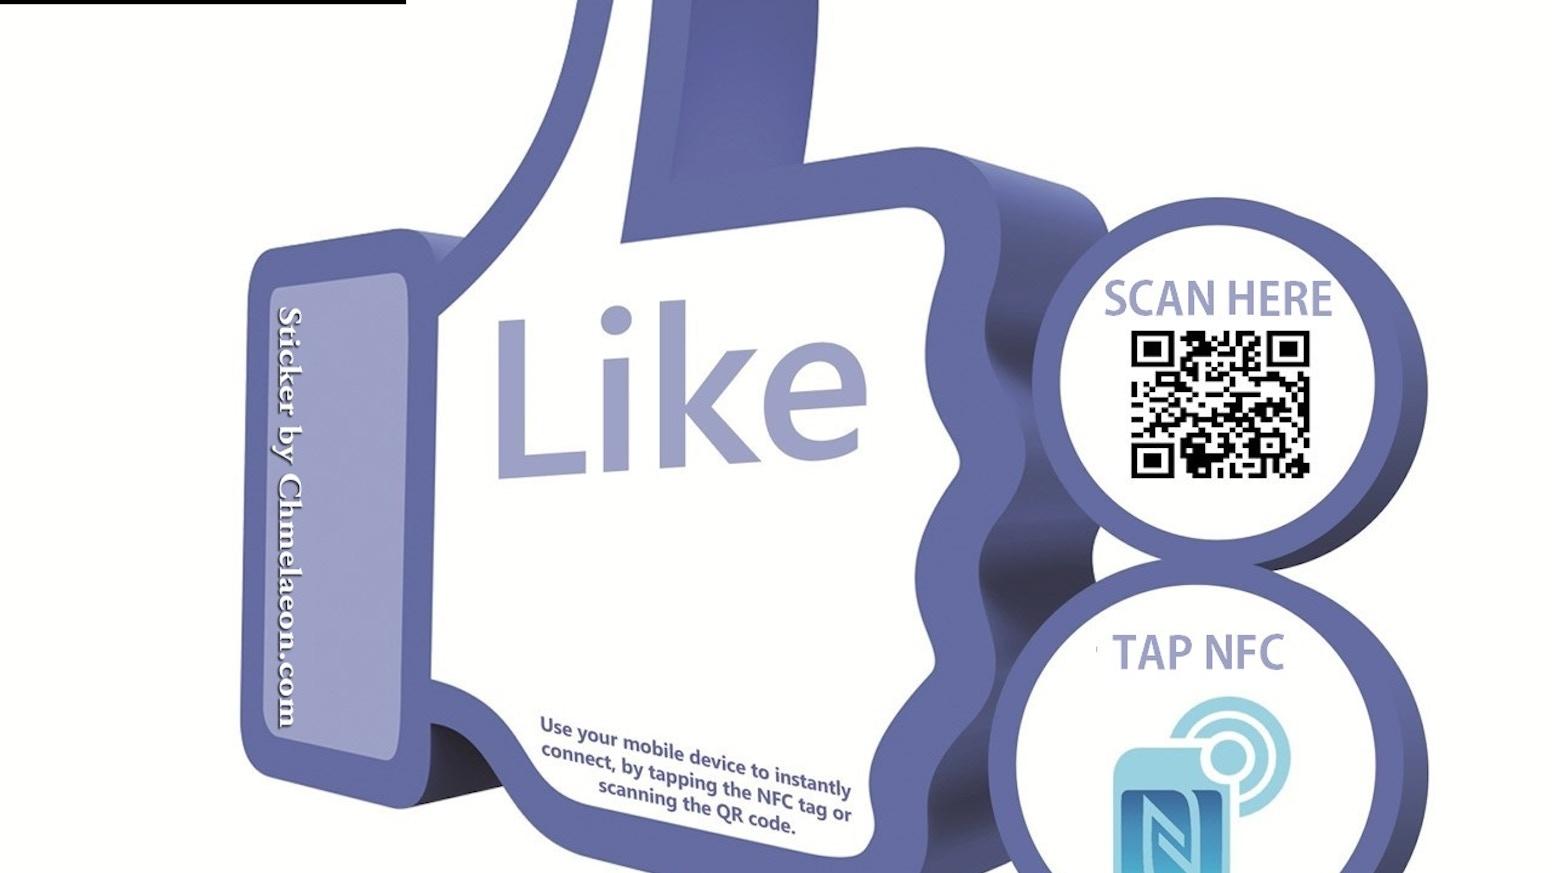 Facebook NFC QR Like & Check in Analytics Innovative Adapt